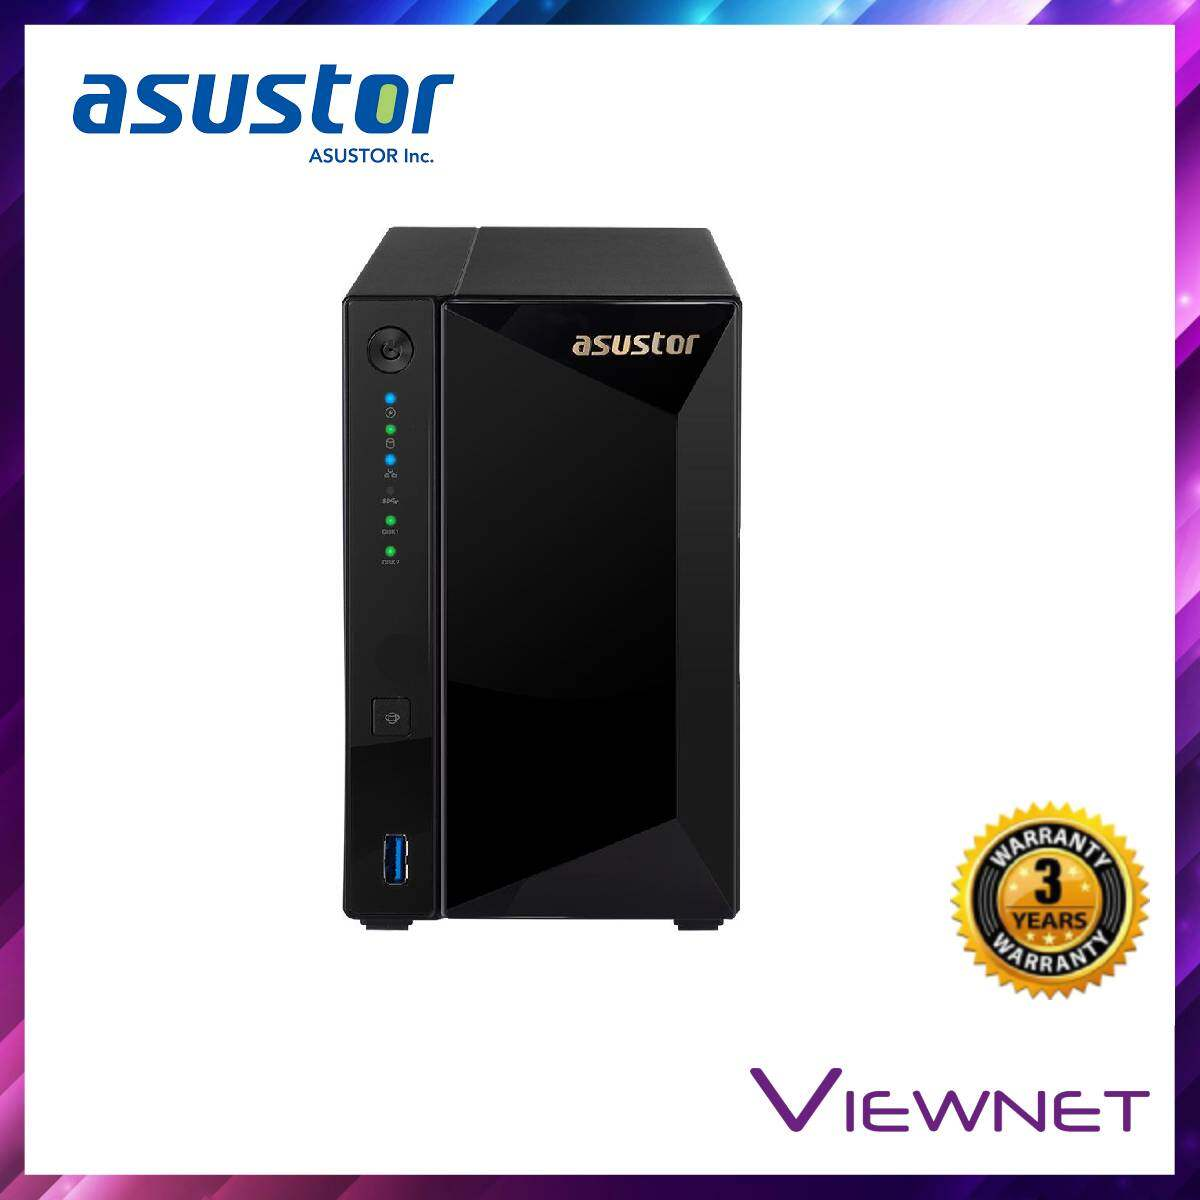 Asustor Enclosure 2-Bays/Marvell Armada 7020 DC 1.6GHz/2GB DDR4/2*1GBE LAN/1*10GBE LAN/HDMI/EXPANDABLE-10U NAS (AS4002T)